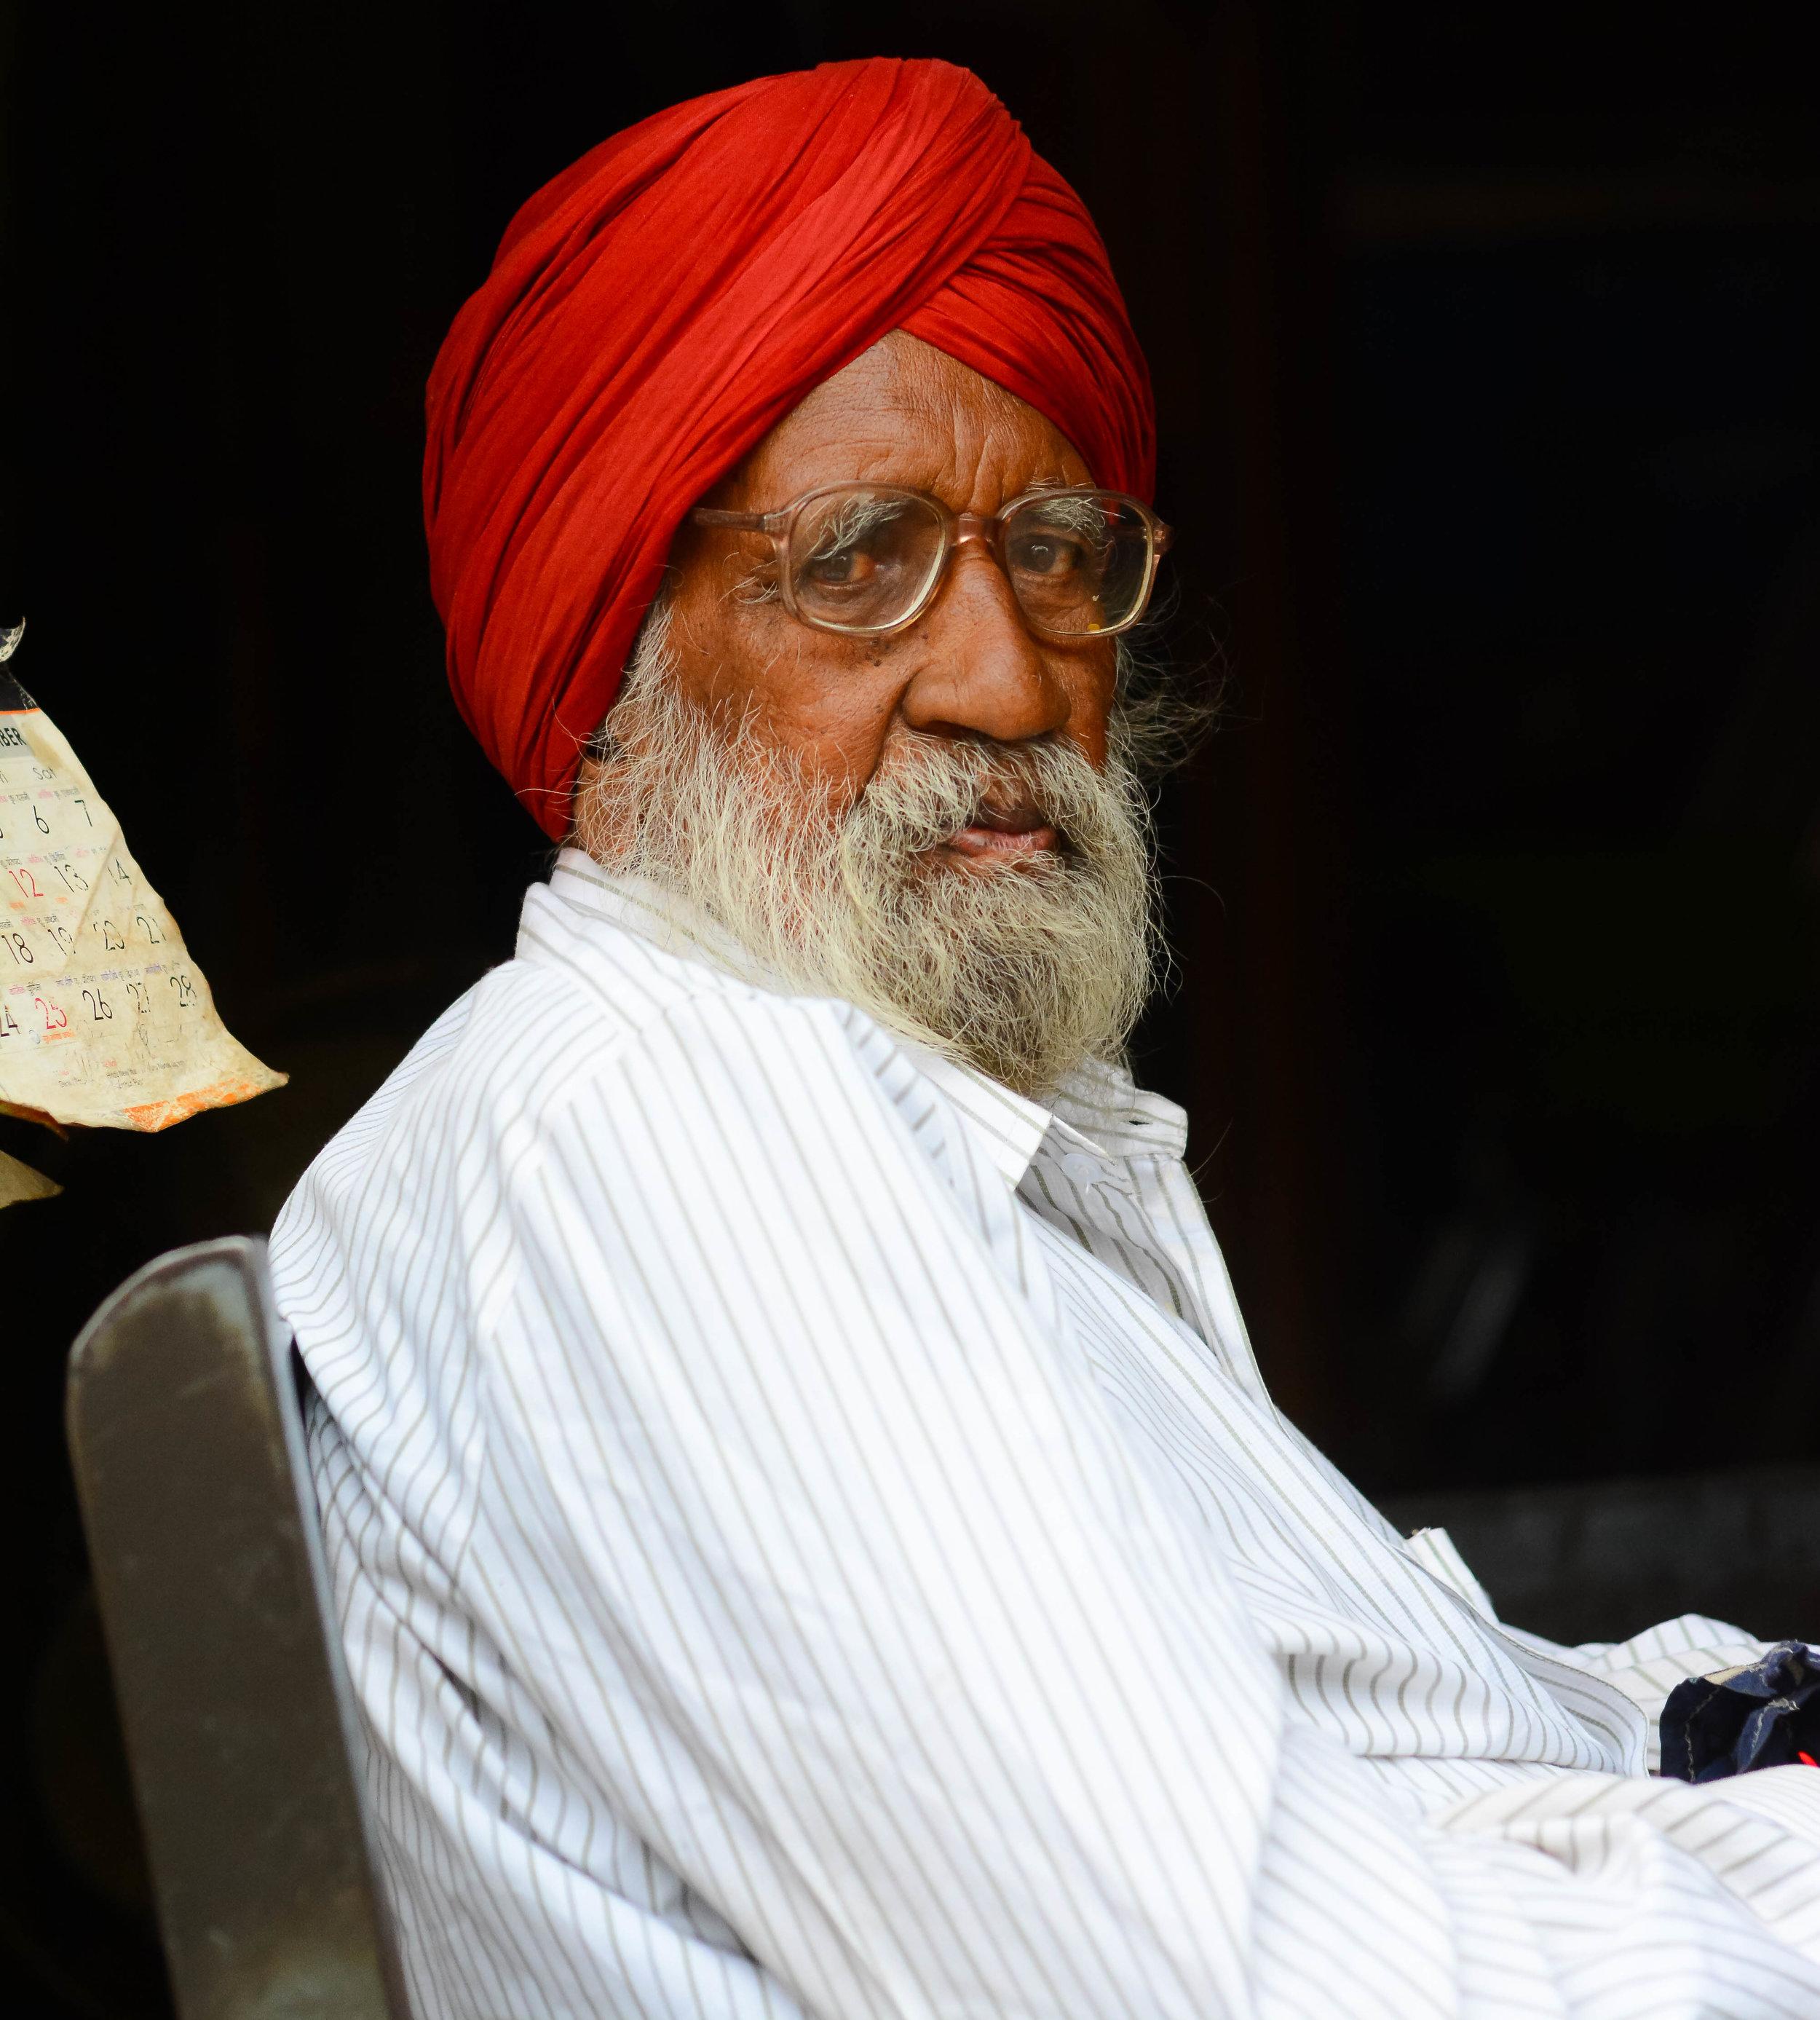 Nikon D7100   50mm f1.8   Jaipur, Rajasthan, India (Out of camera JPEG)